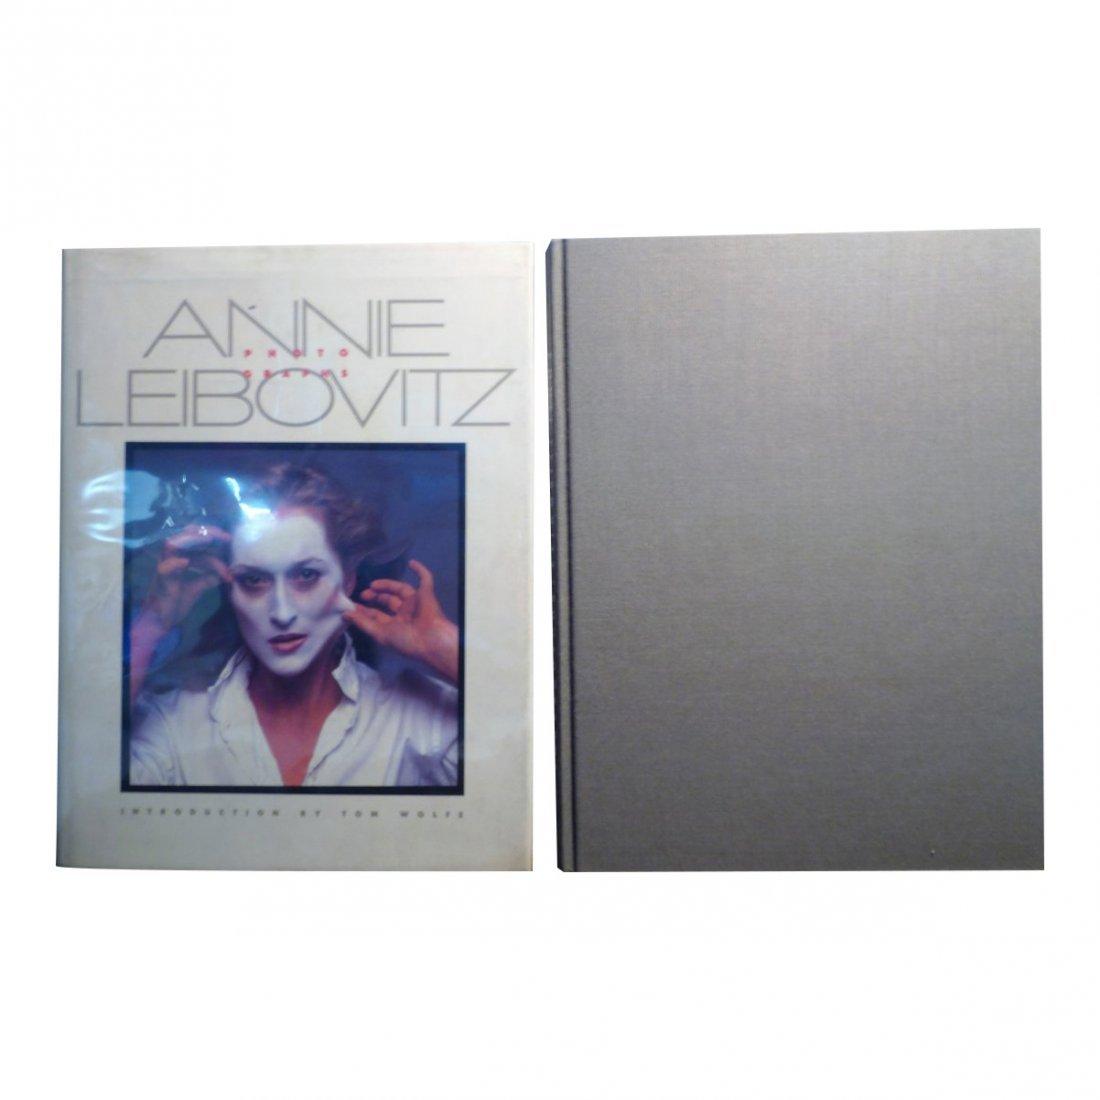 Annie Leibovitz: Photographs - Signed